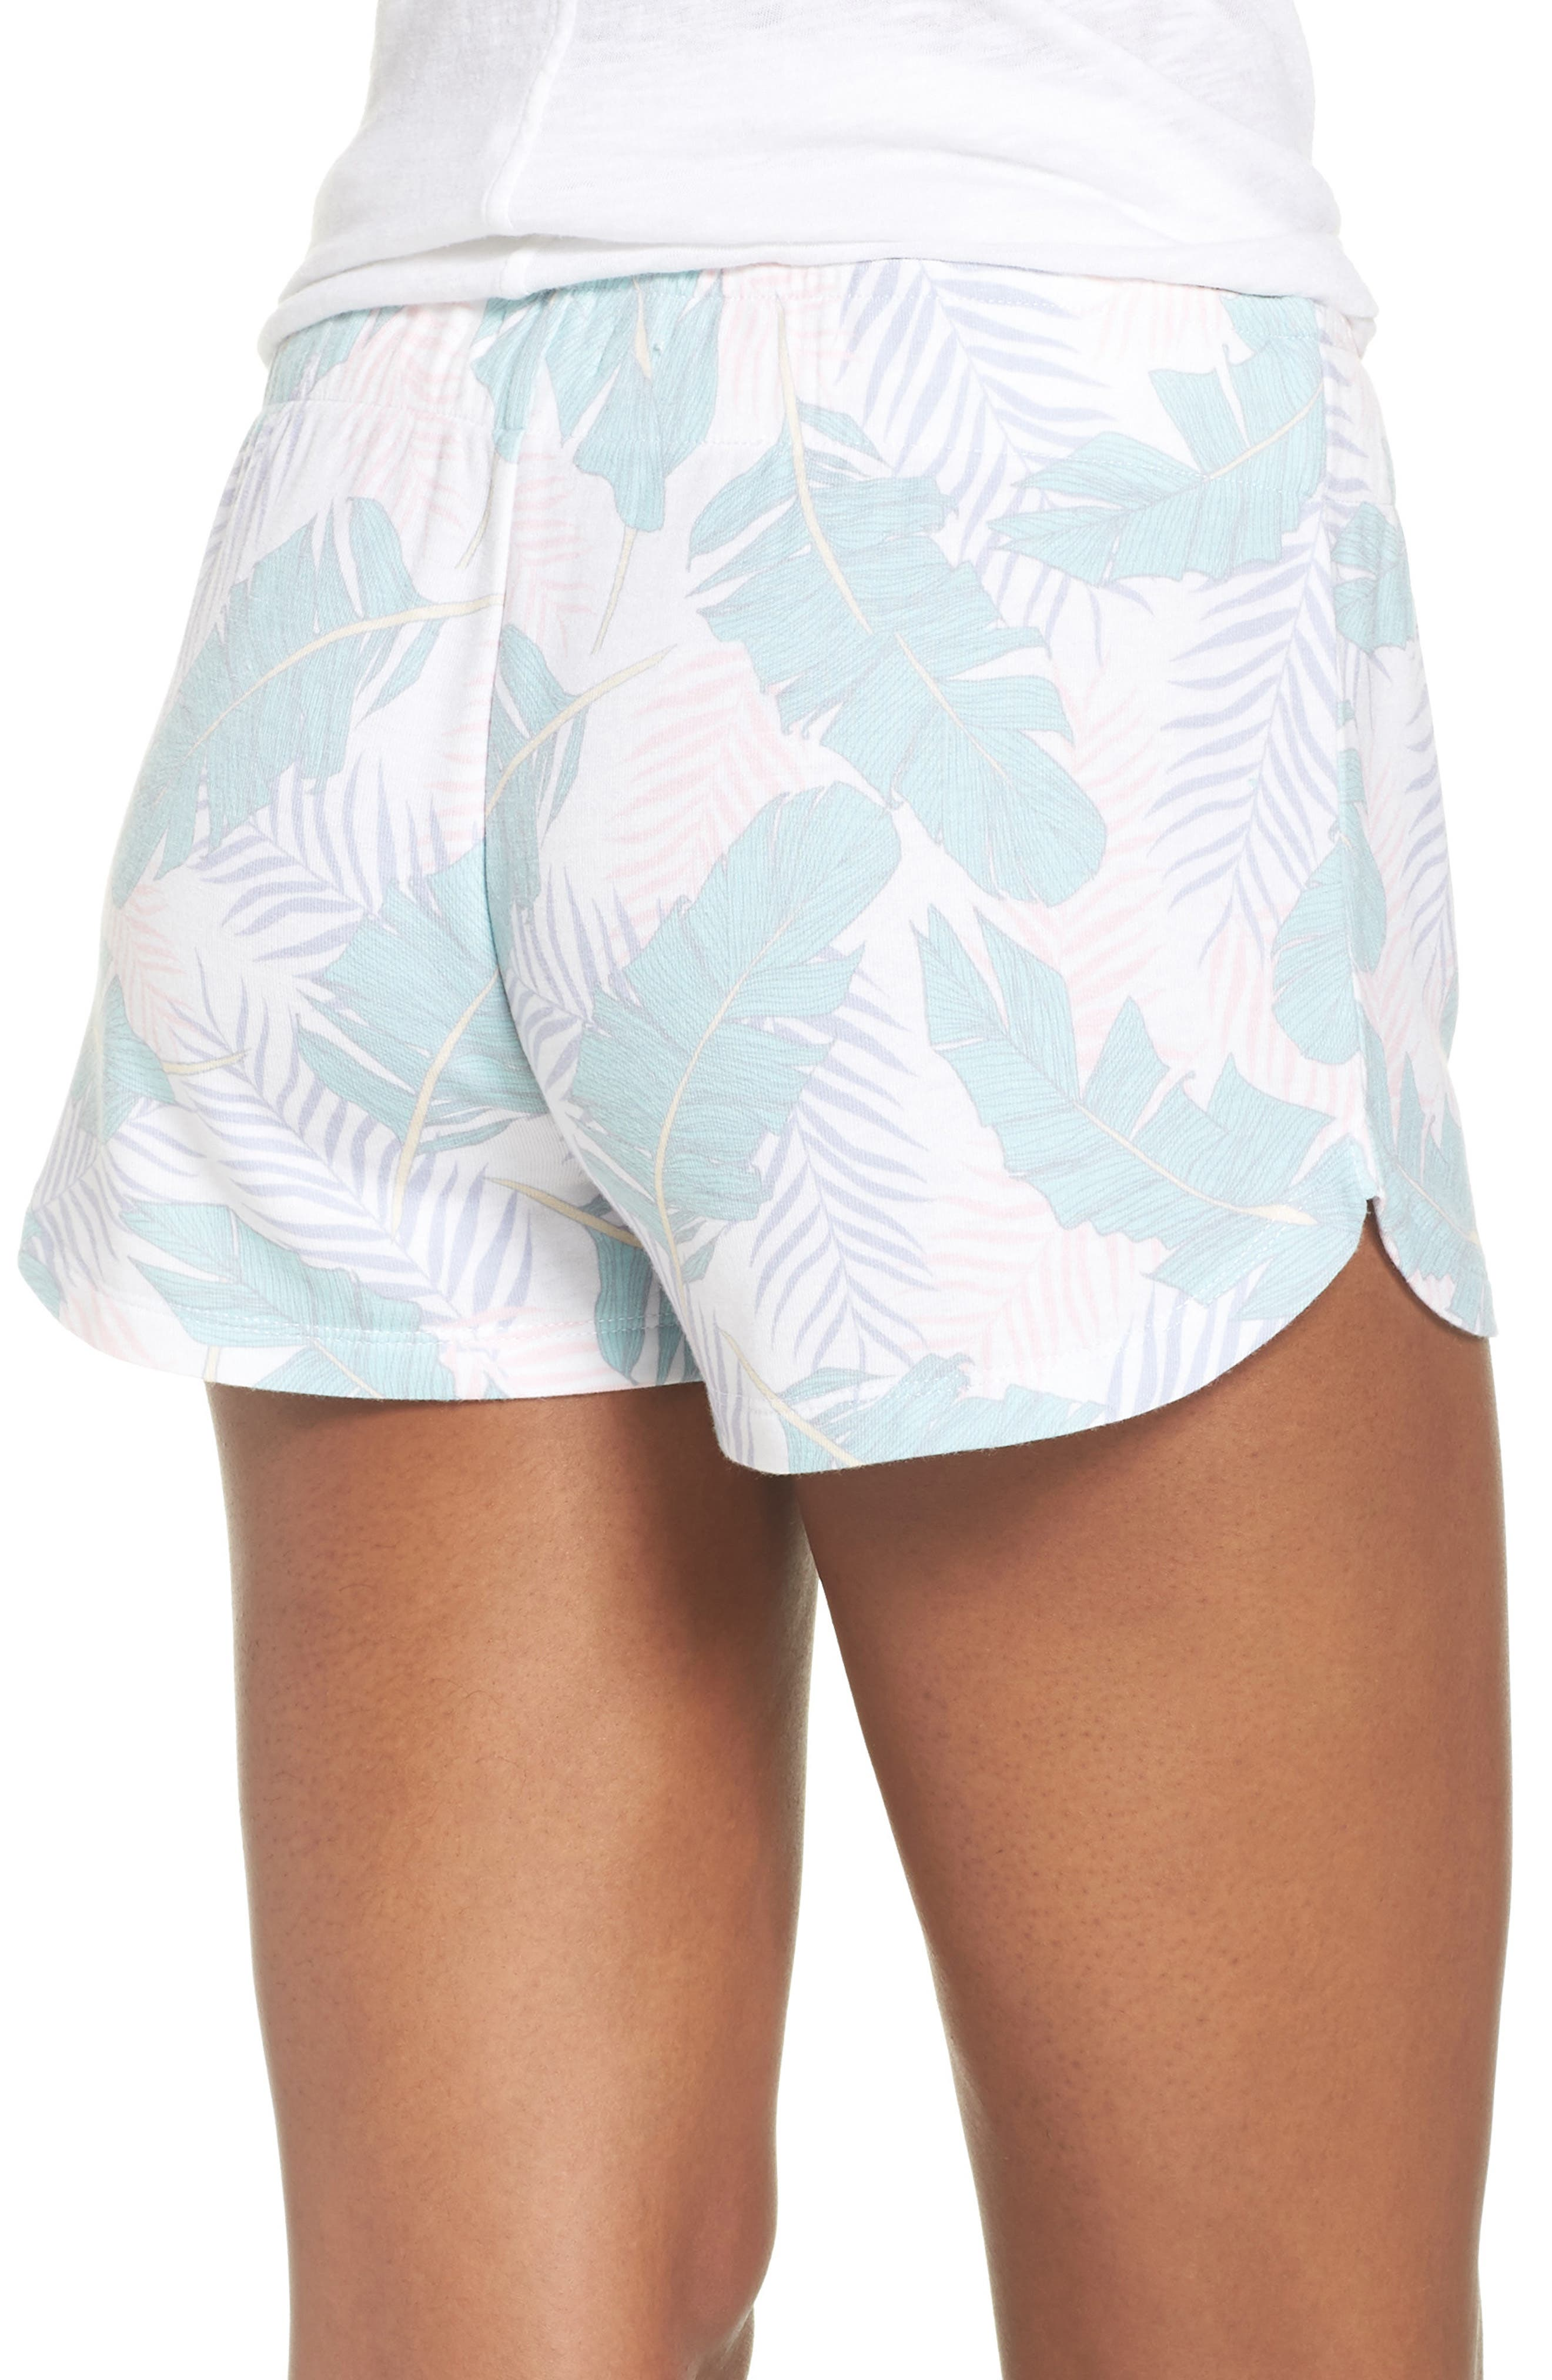 Lounge Shorts,                             Alternate thumbnail 2, color,                             100